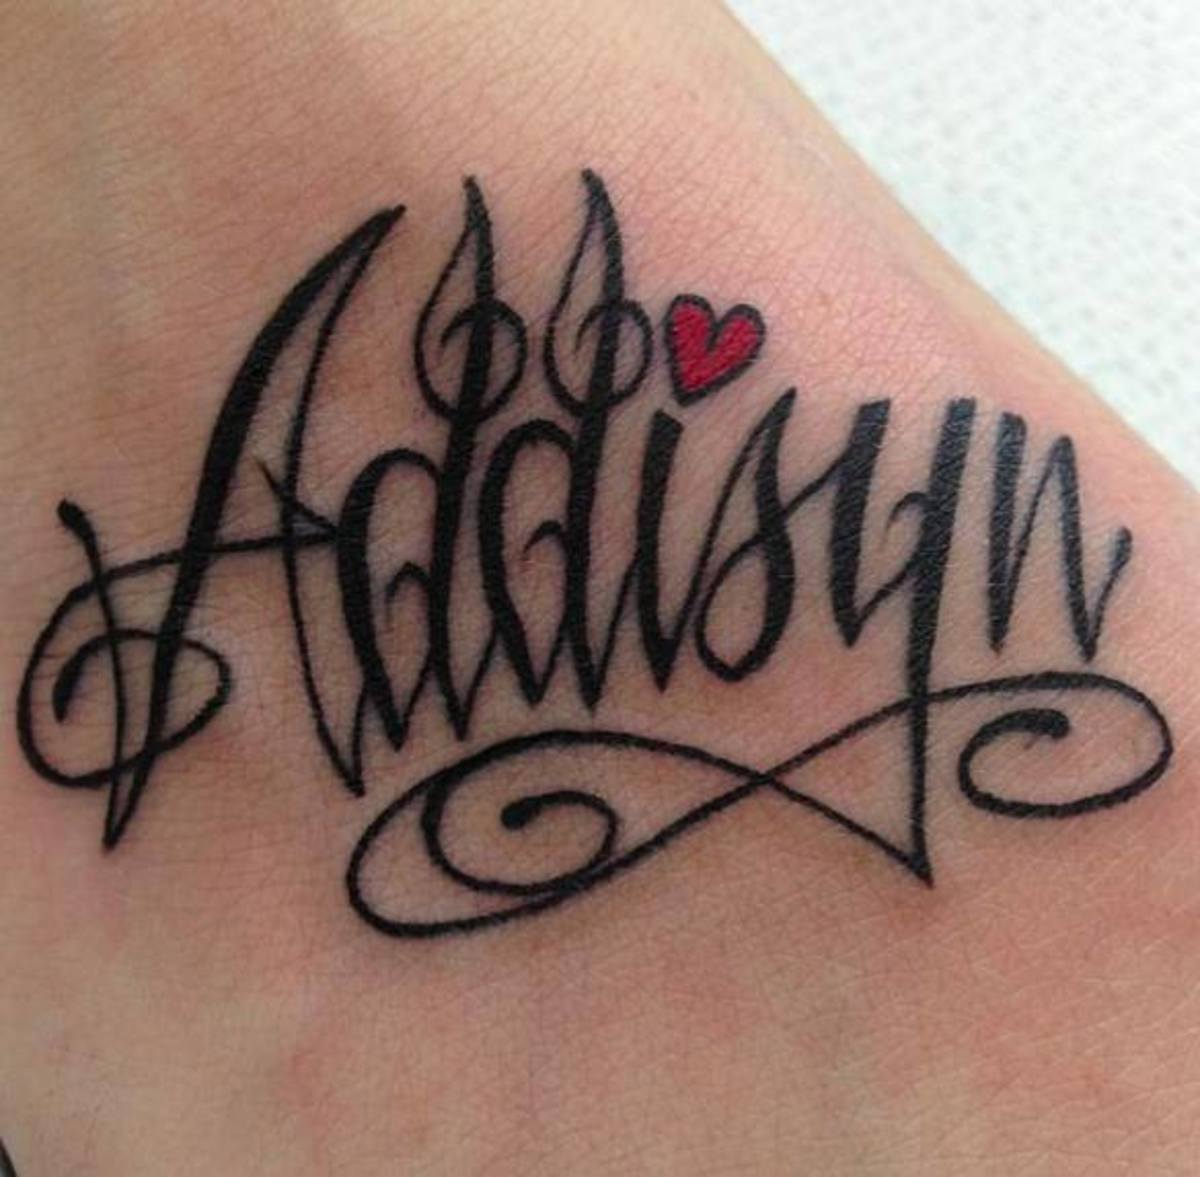 Musical adaptation of a script tattoo.